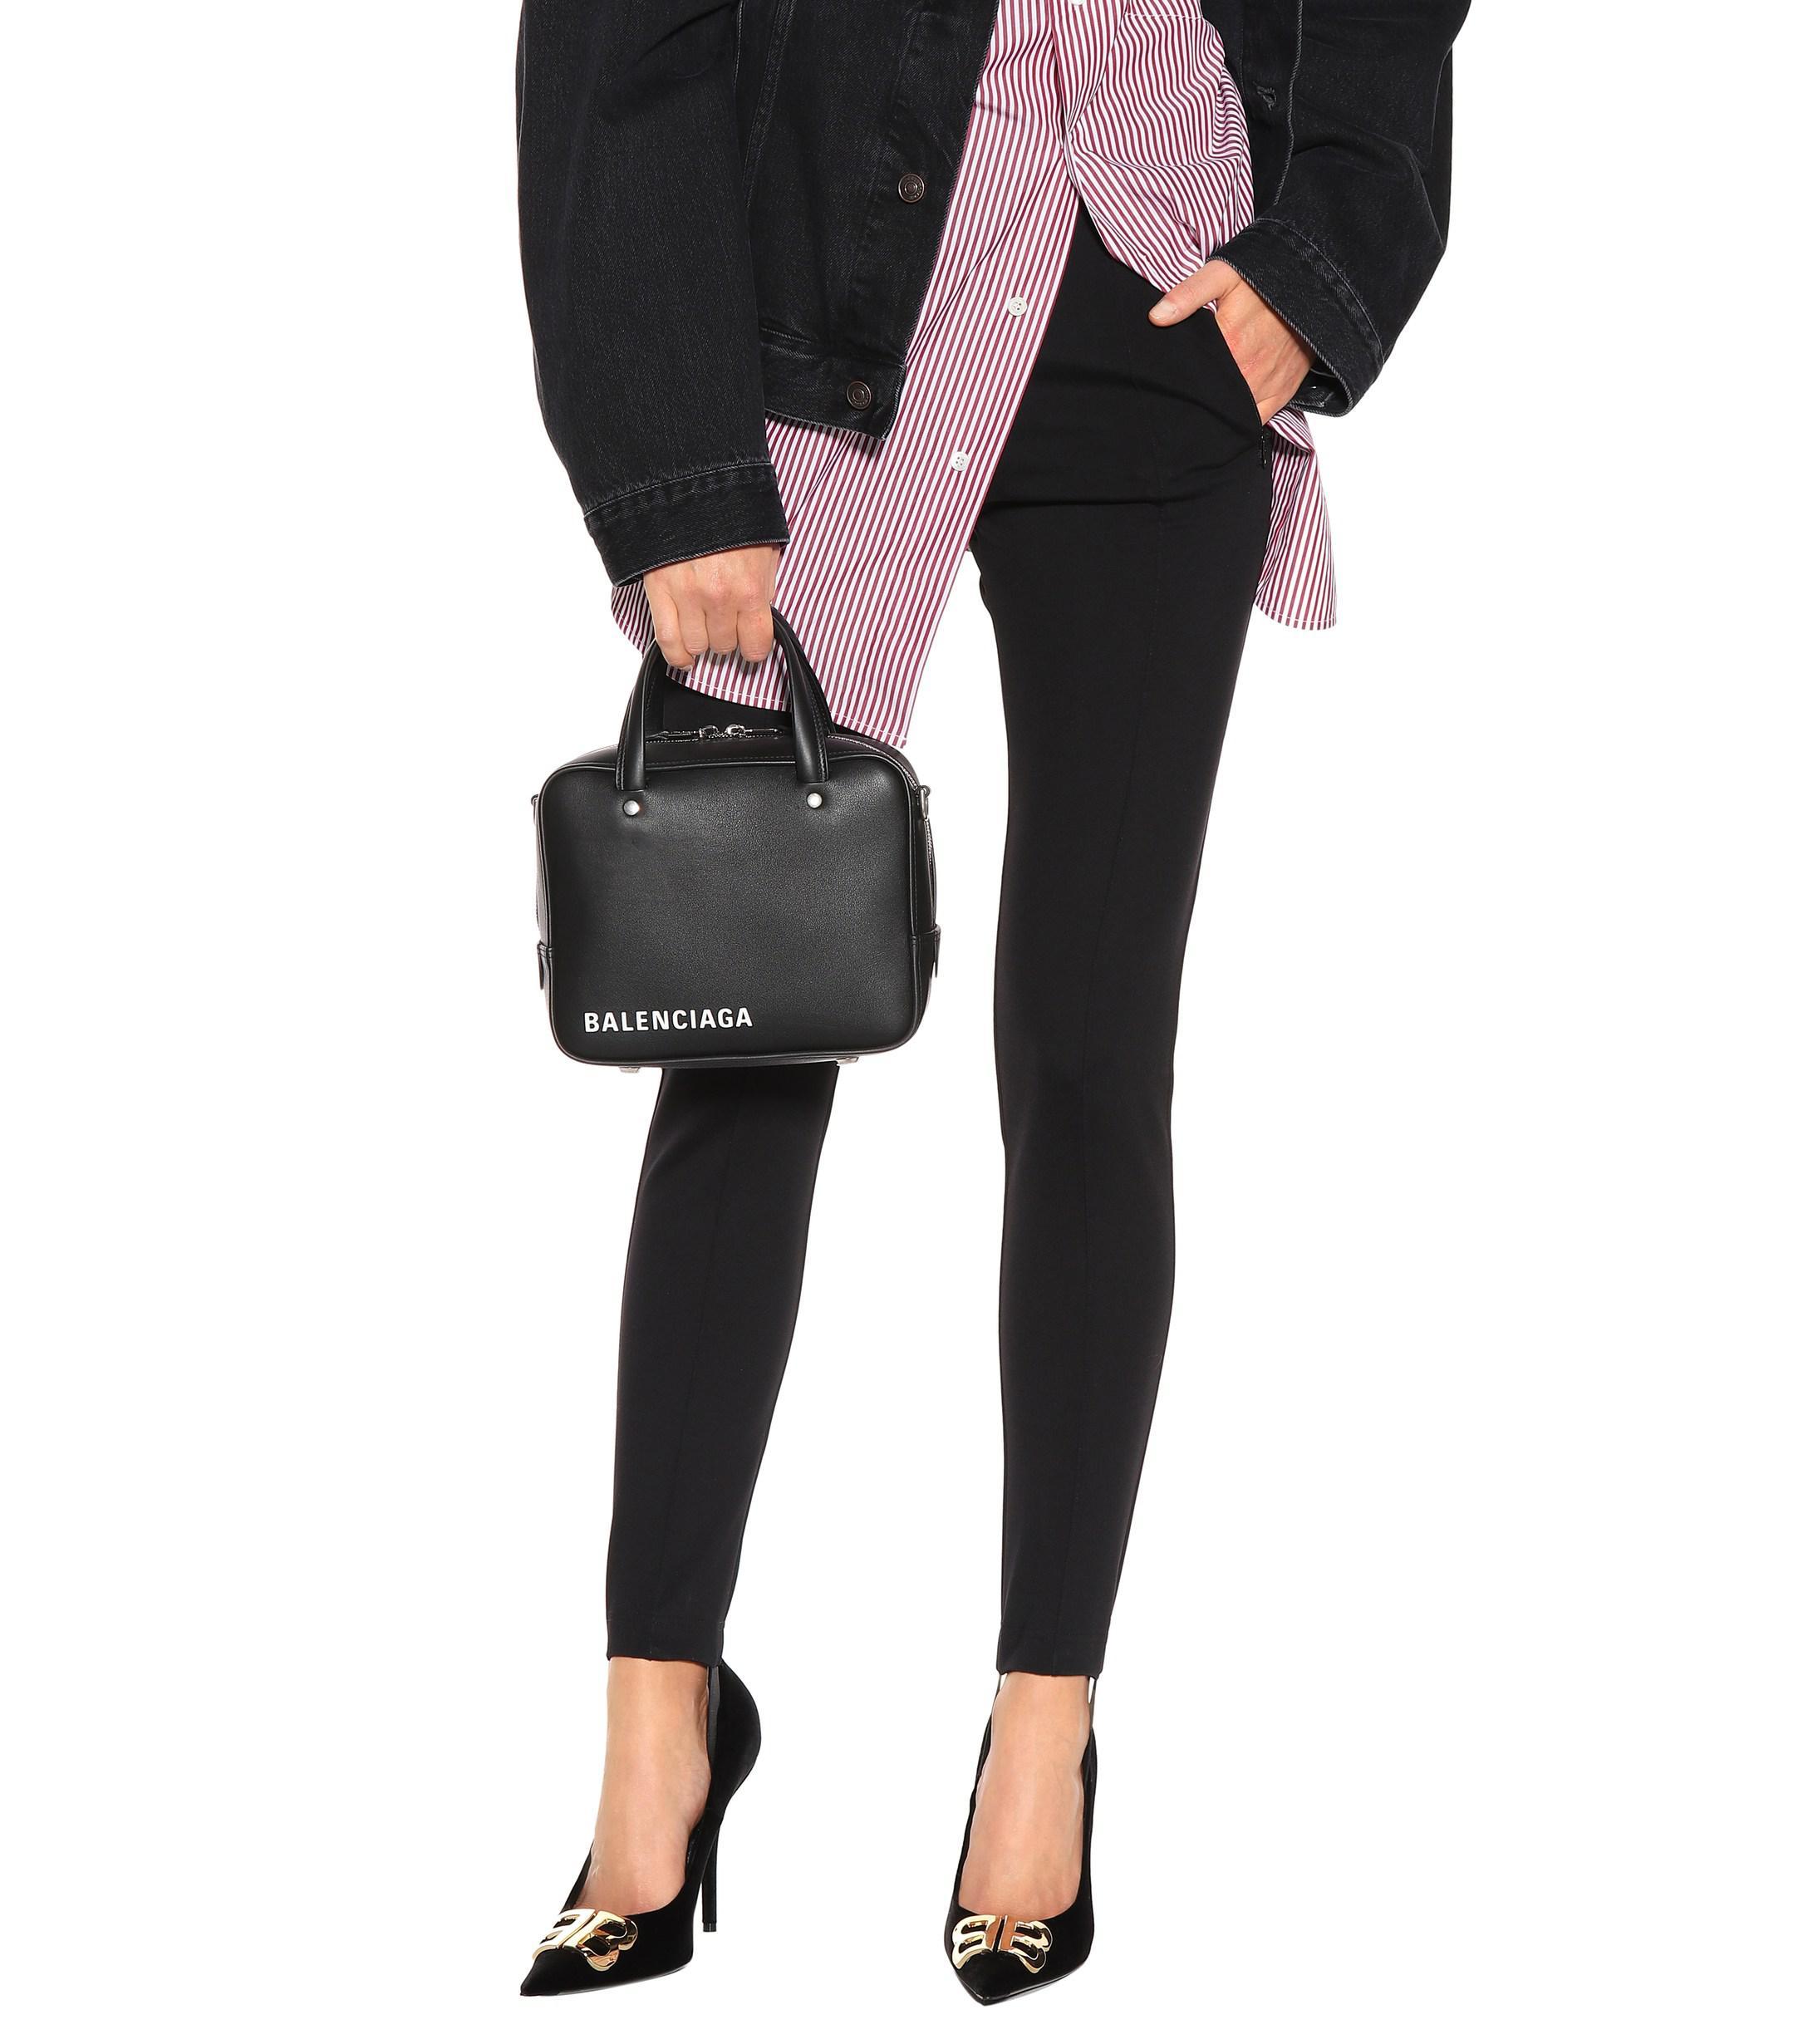 eb7b80fdd9a Lyst - Balenciaga Triangle Square Xs Shoulder Bag in Black